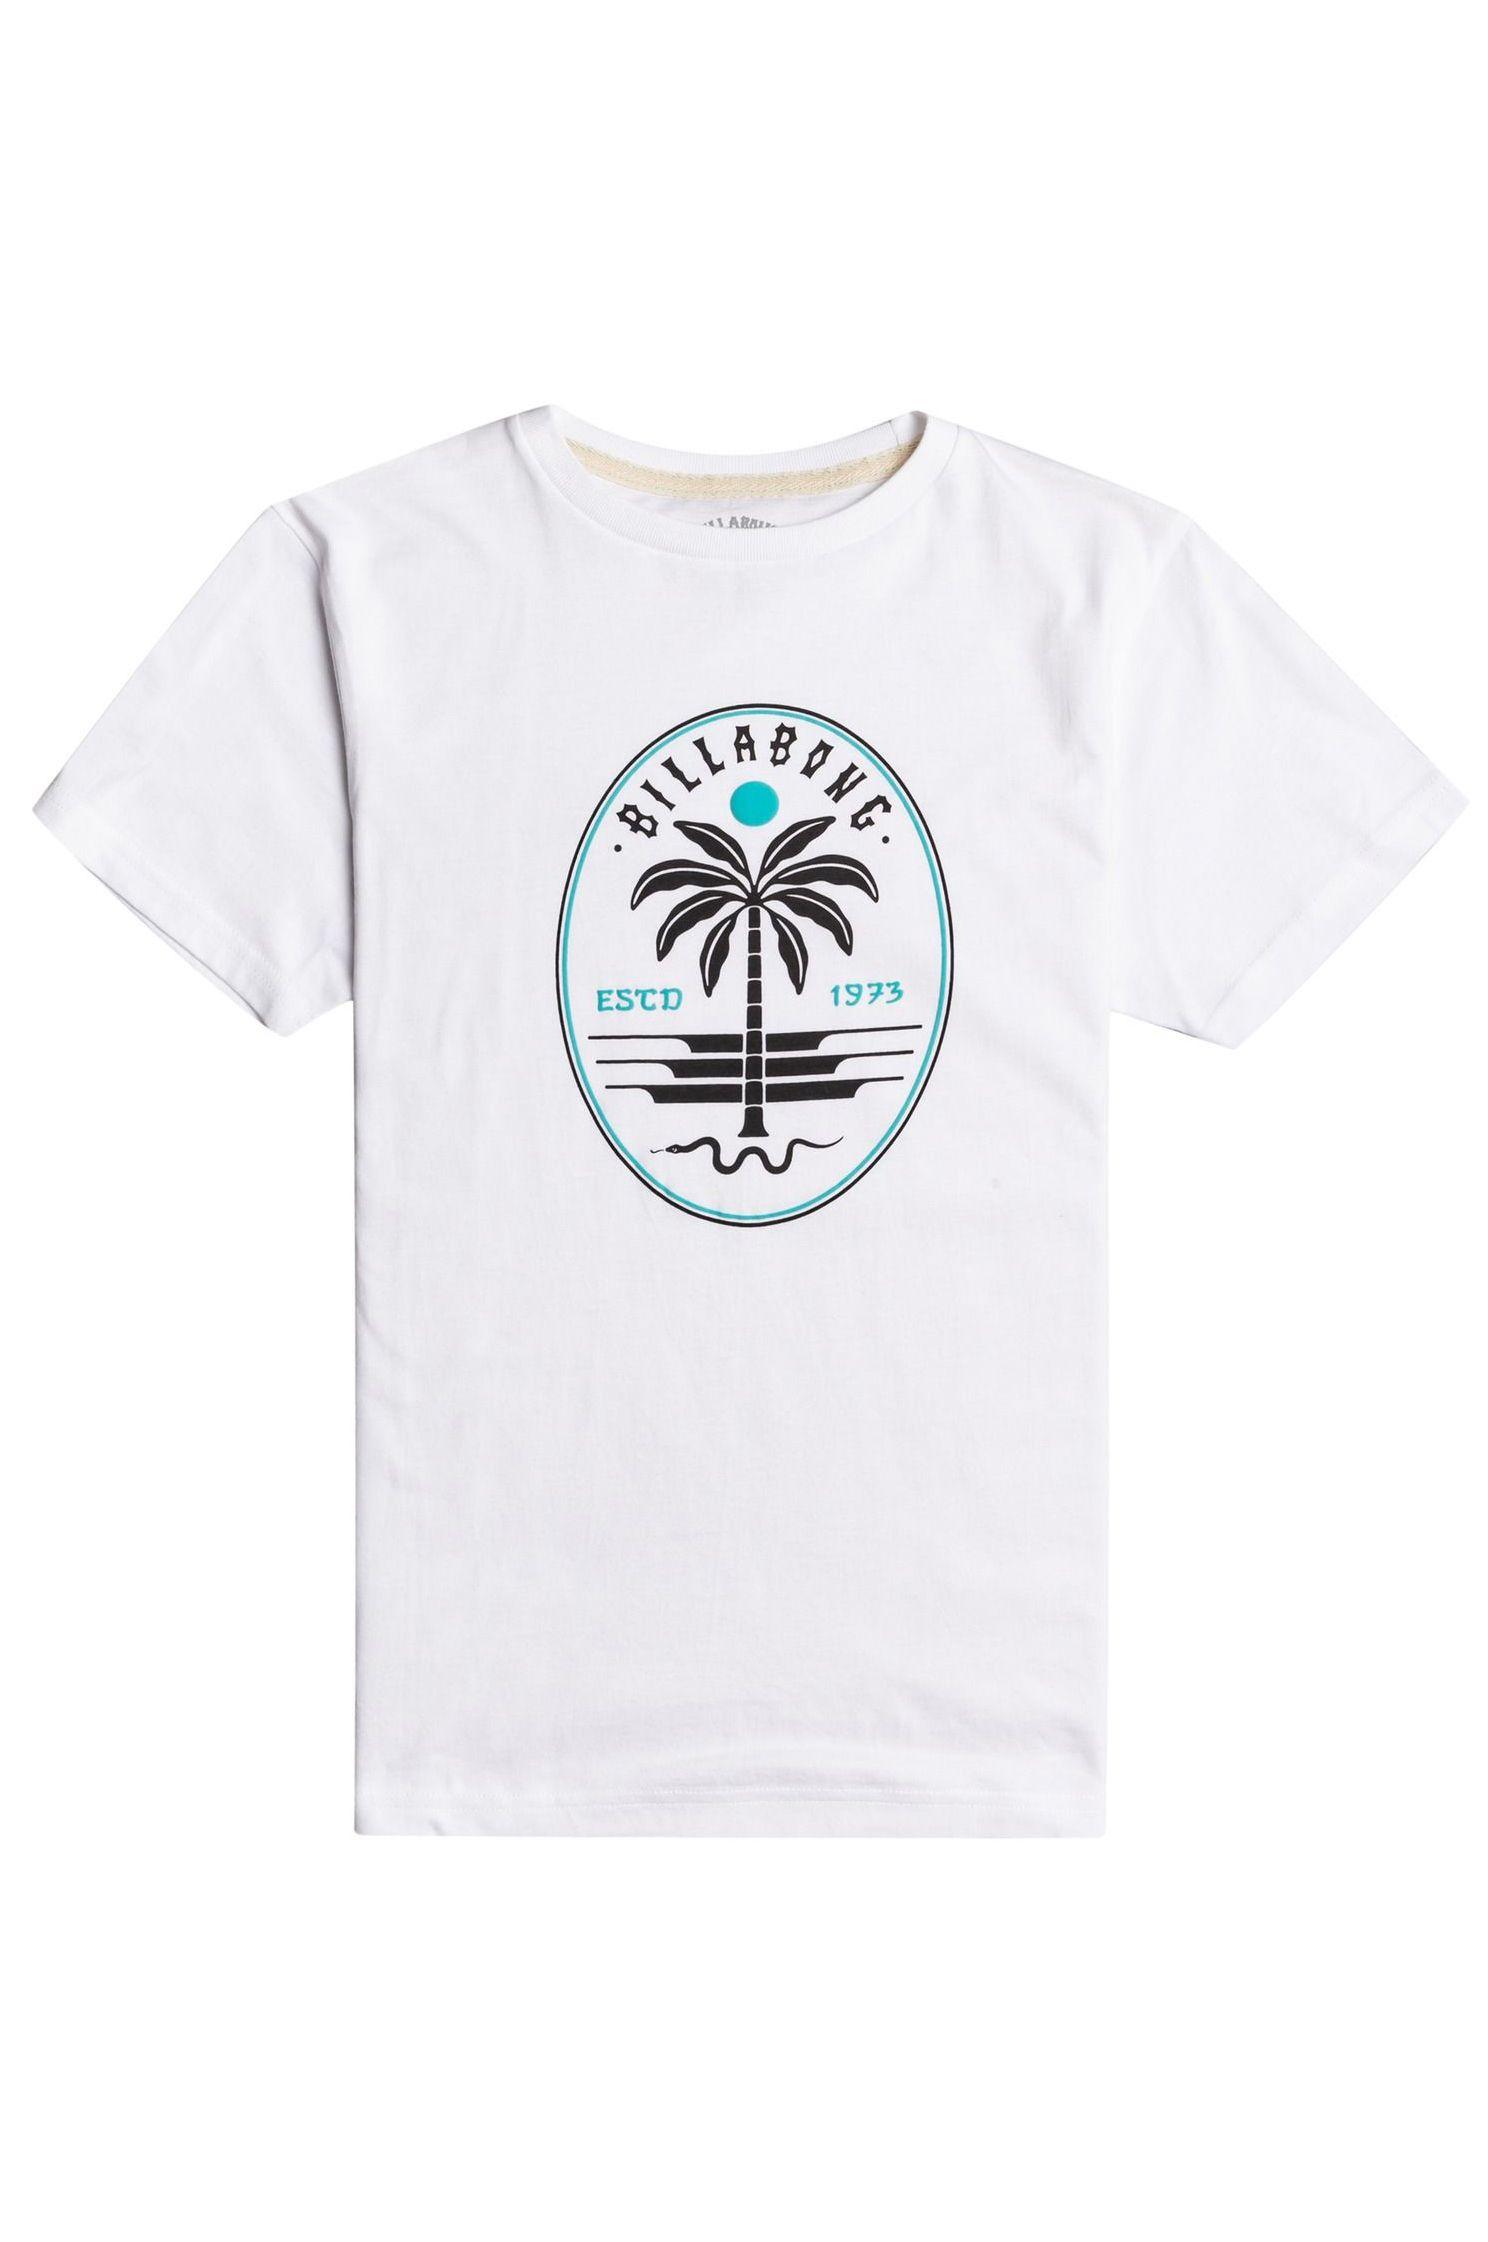 T-Shirt Billabong SNAKE SET SS BOY SPORTING GOOD PROGR. White